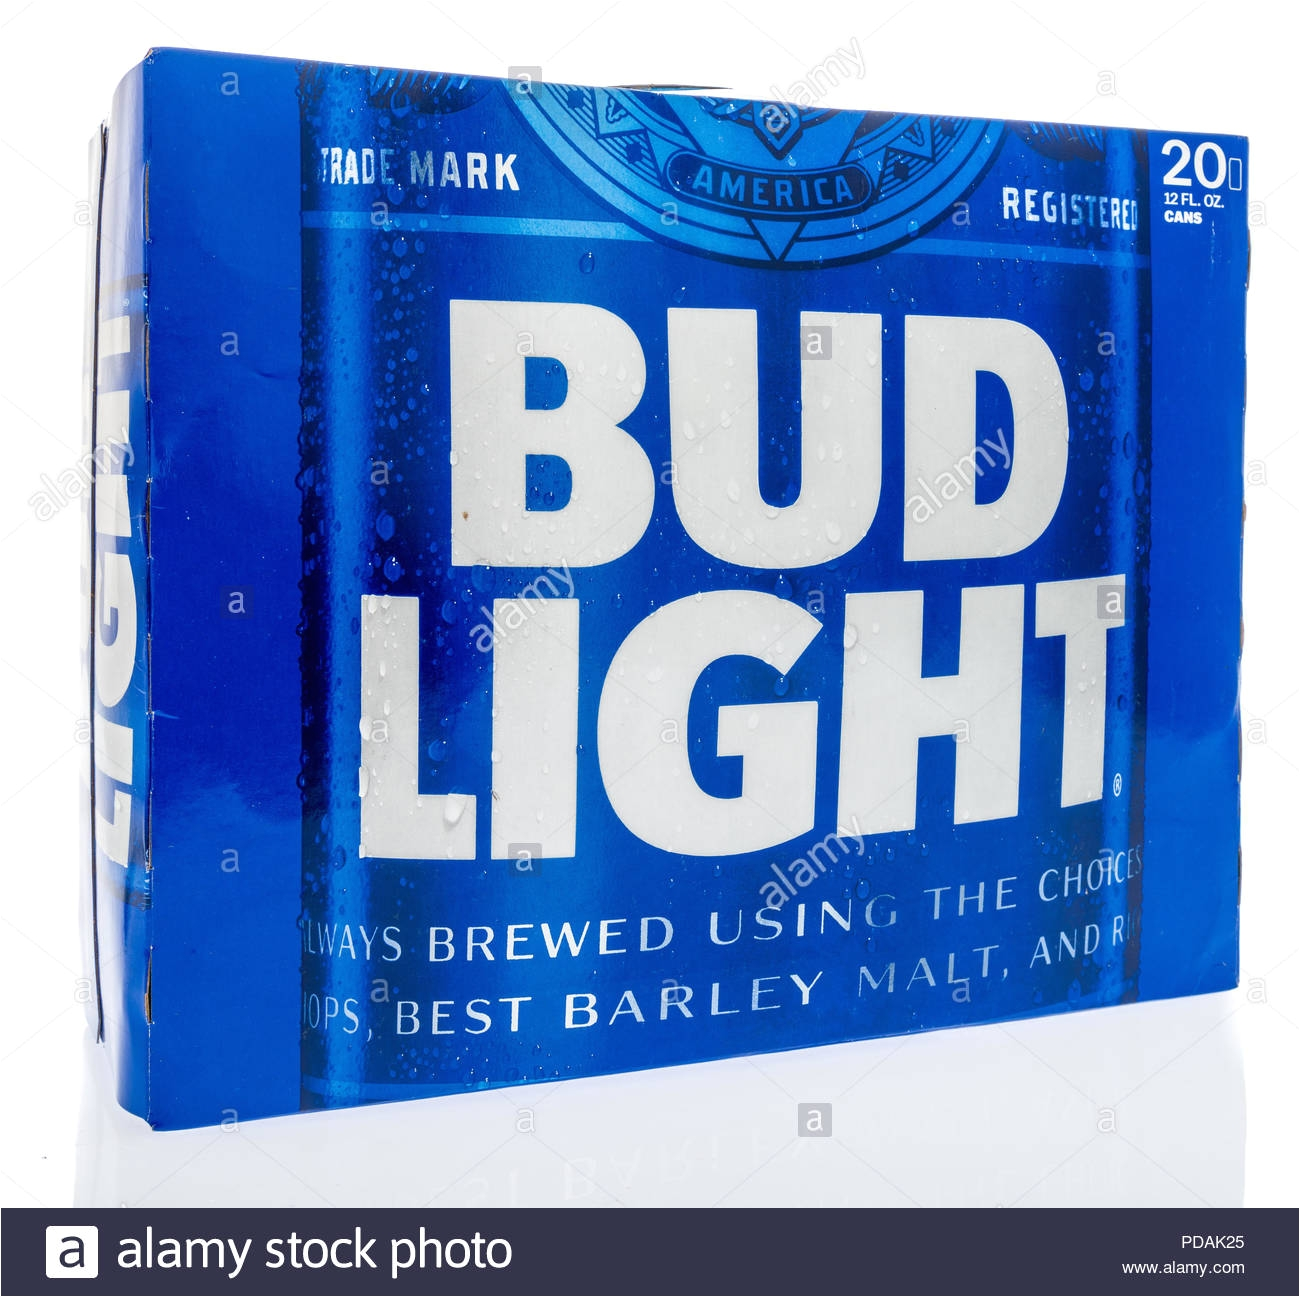 winneconne wi 7 august 2018 a case of bud light beer on an